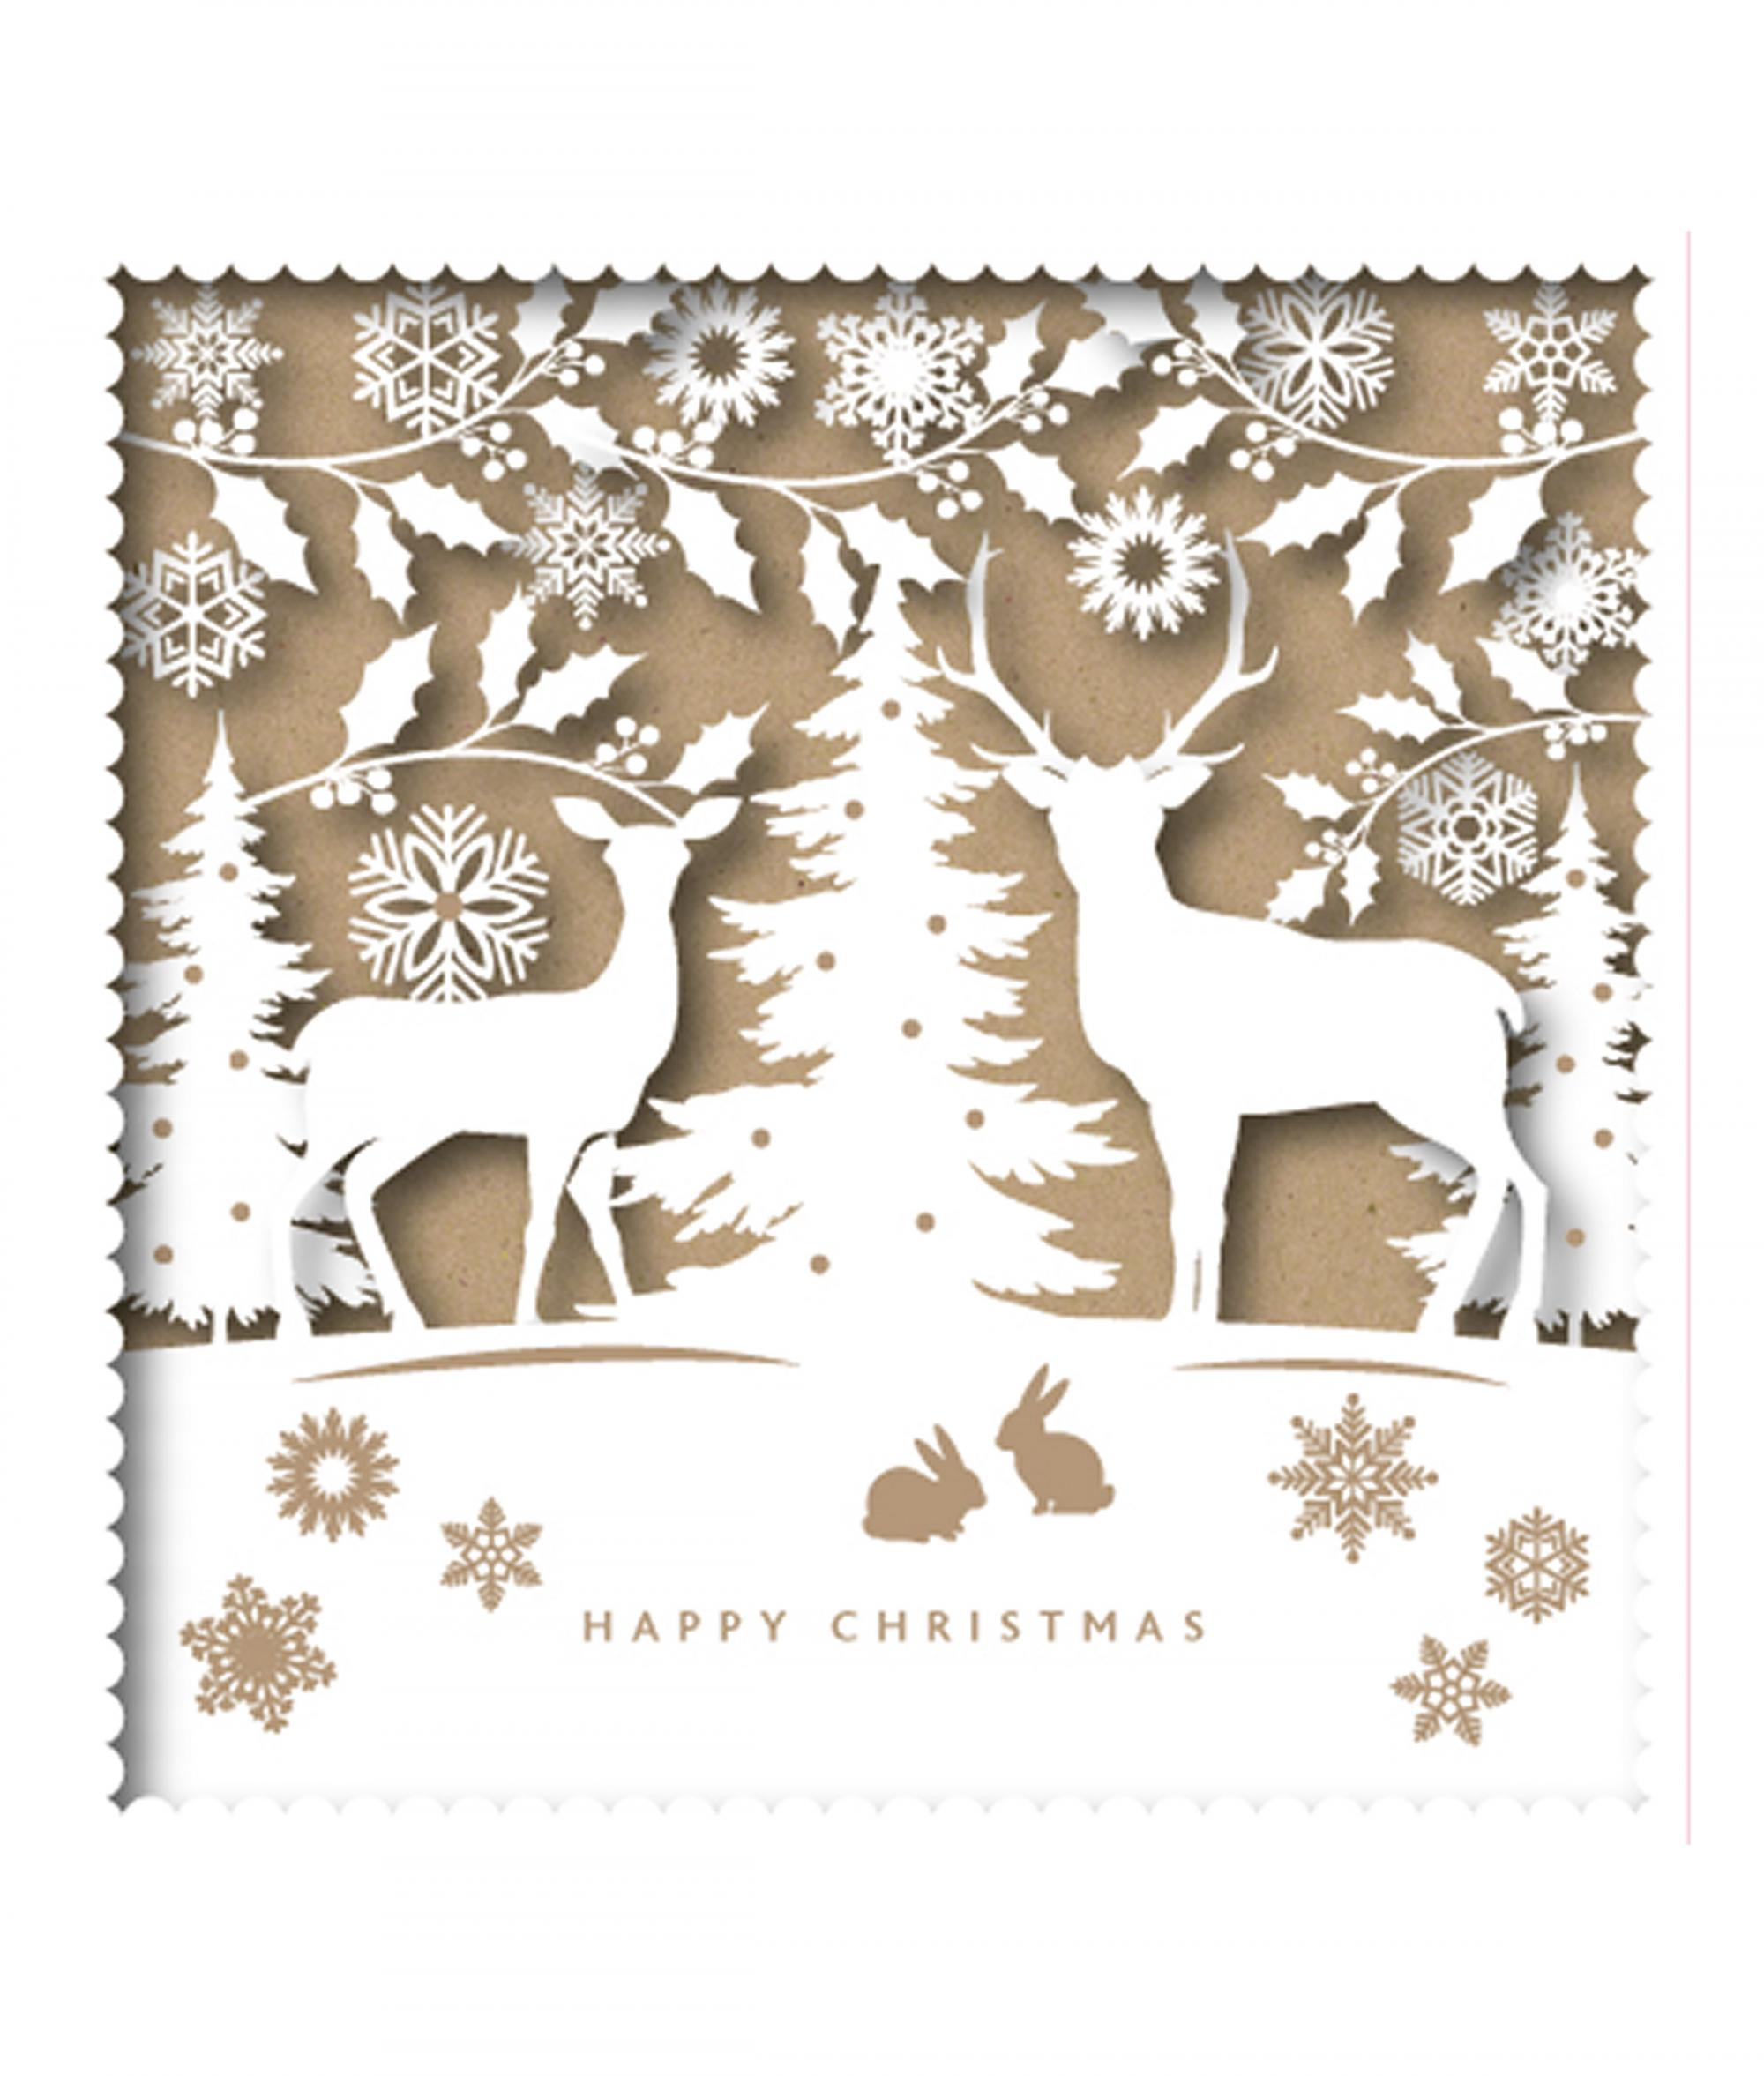 Reindeer Christmas Cards.Silhouette Reindeer Christmas Card Pack Of 10 Cancer